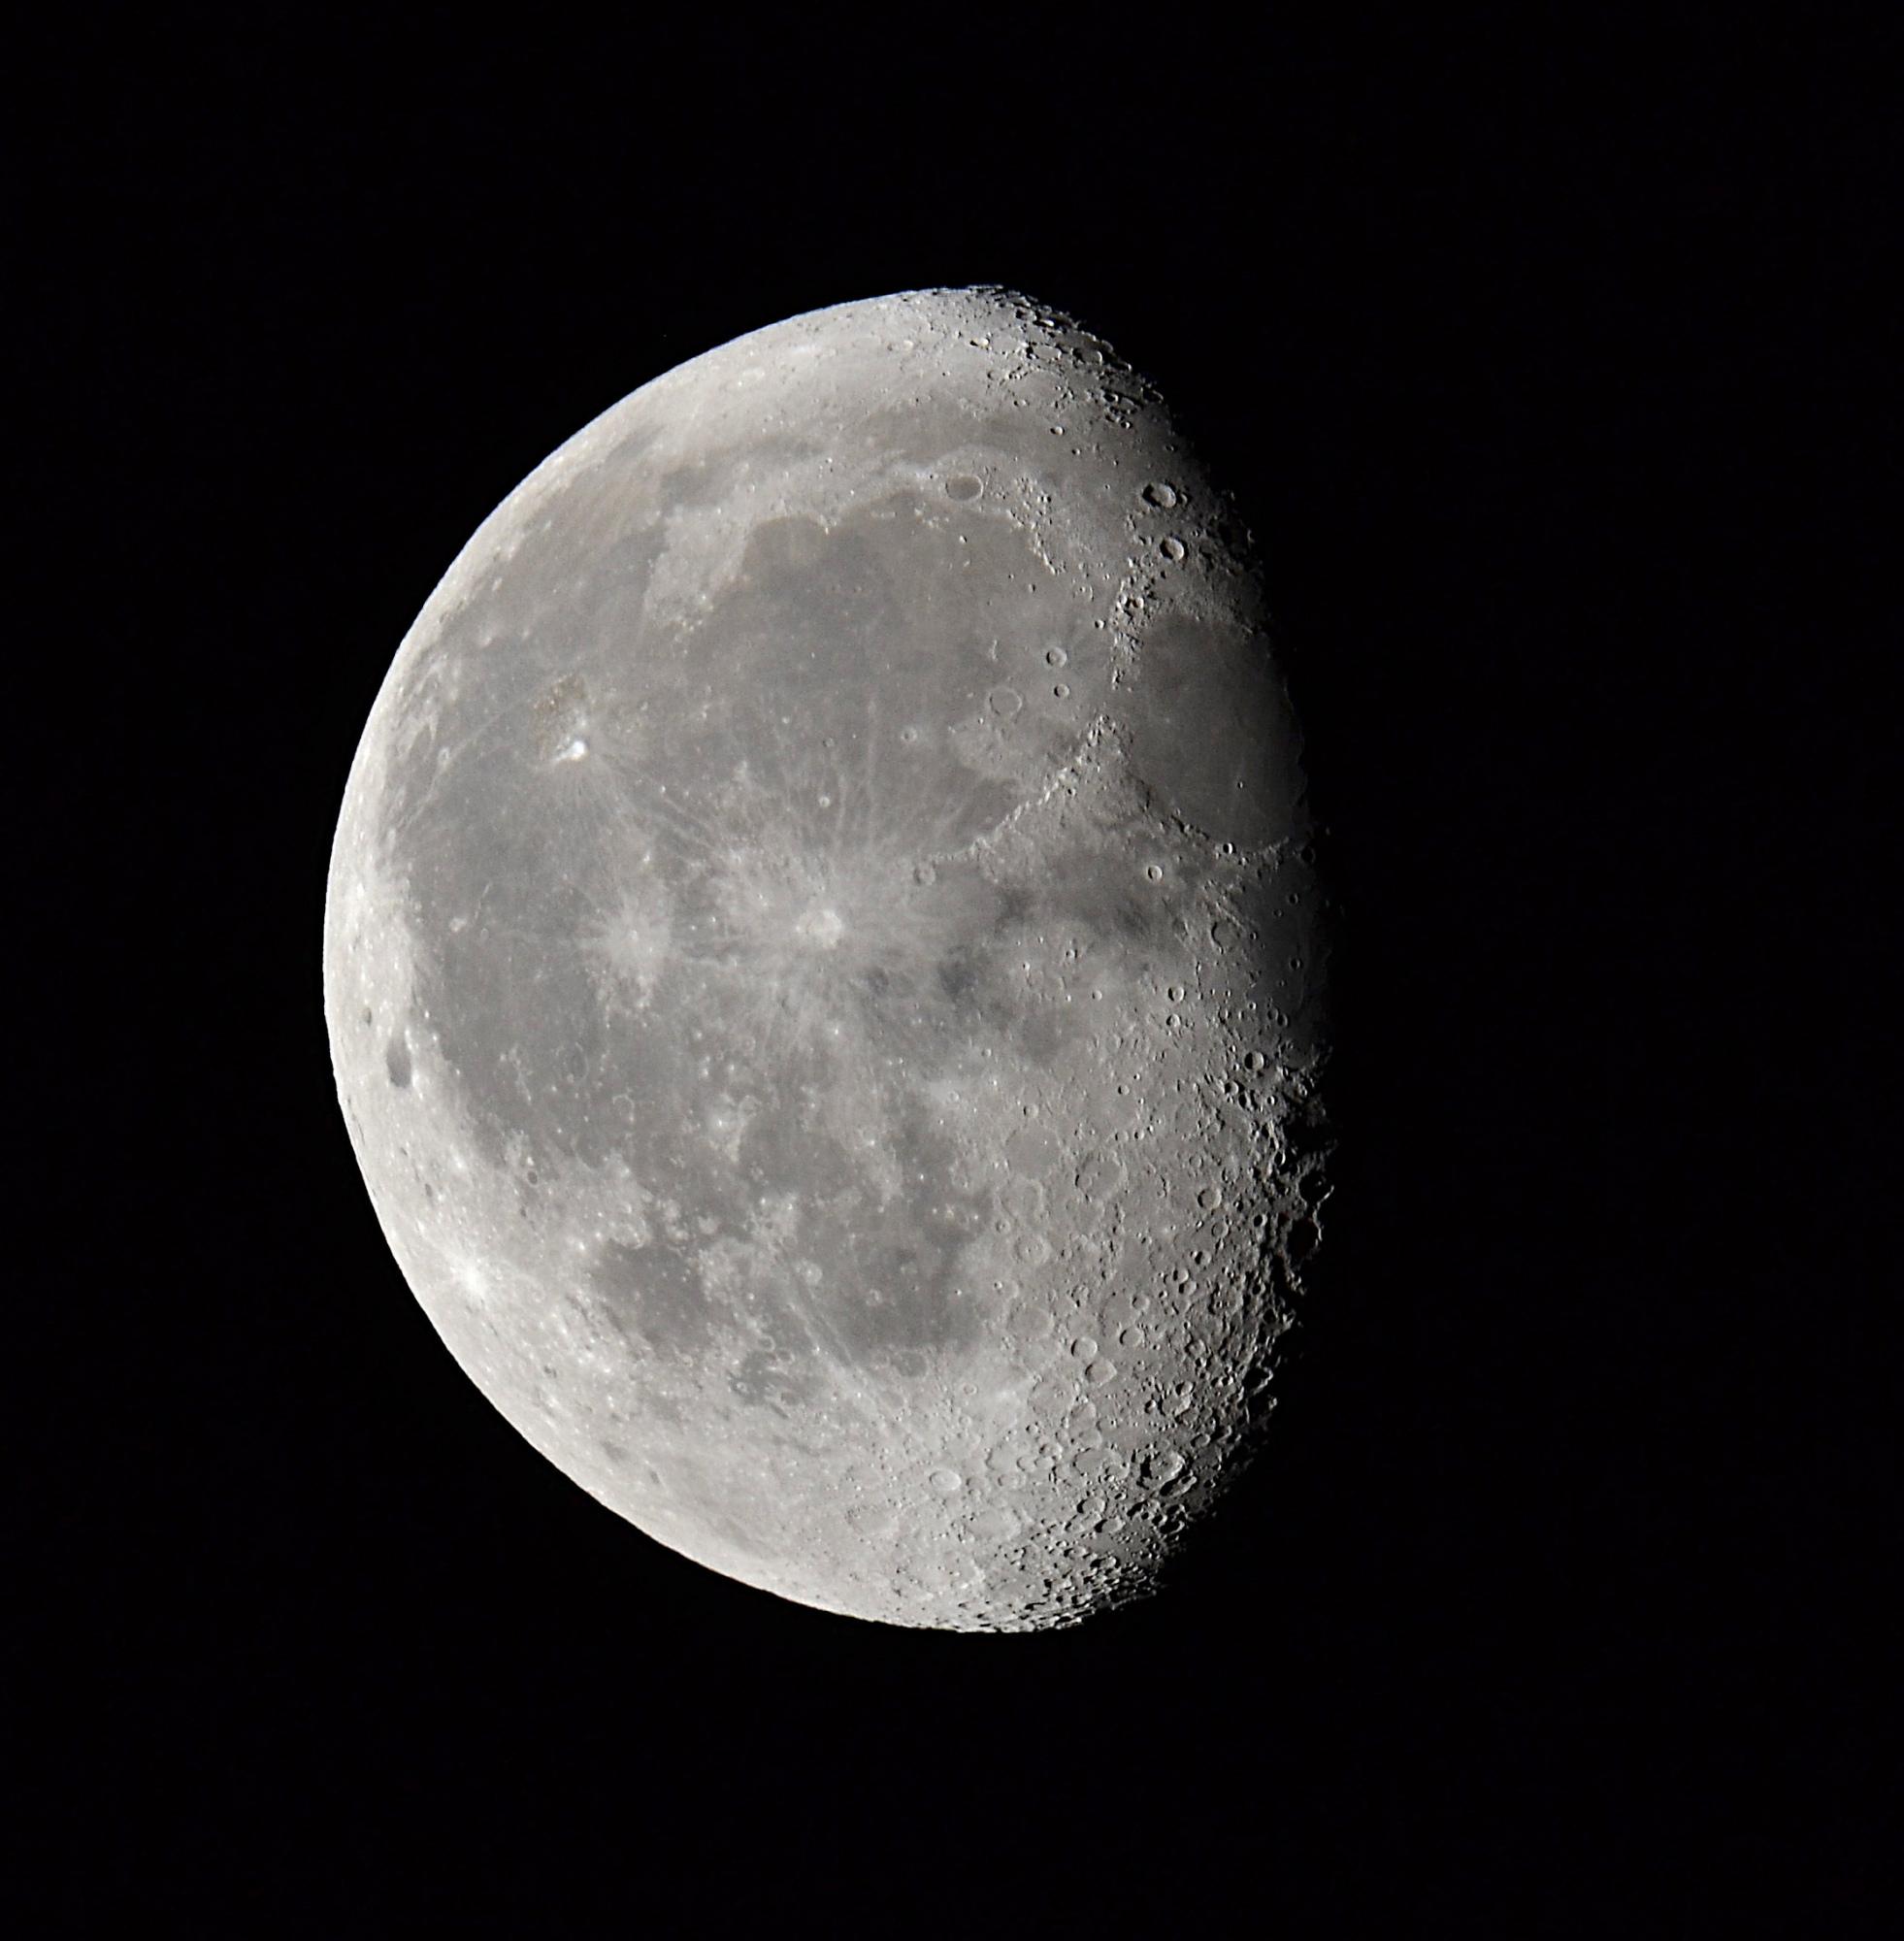 Lune-recadree.JPG